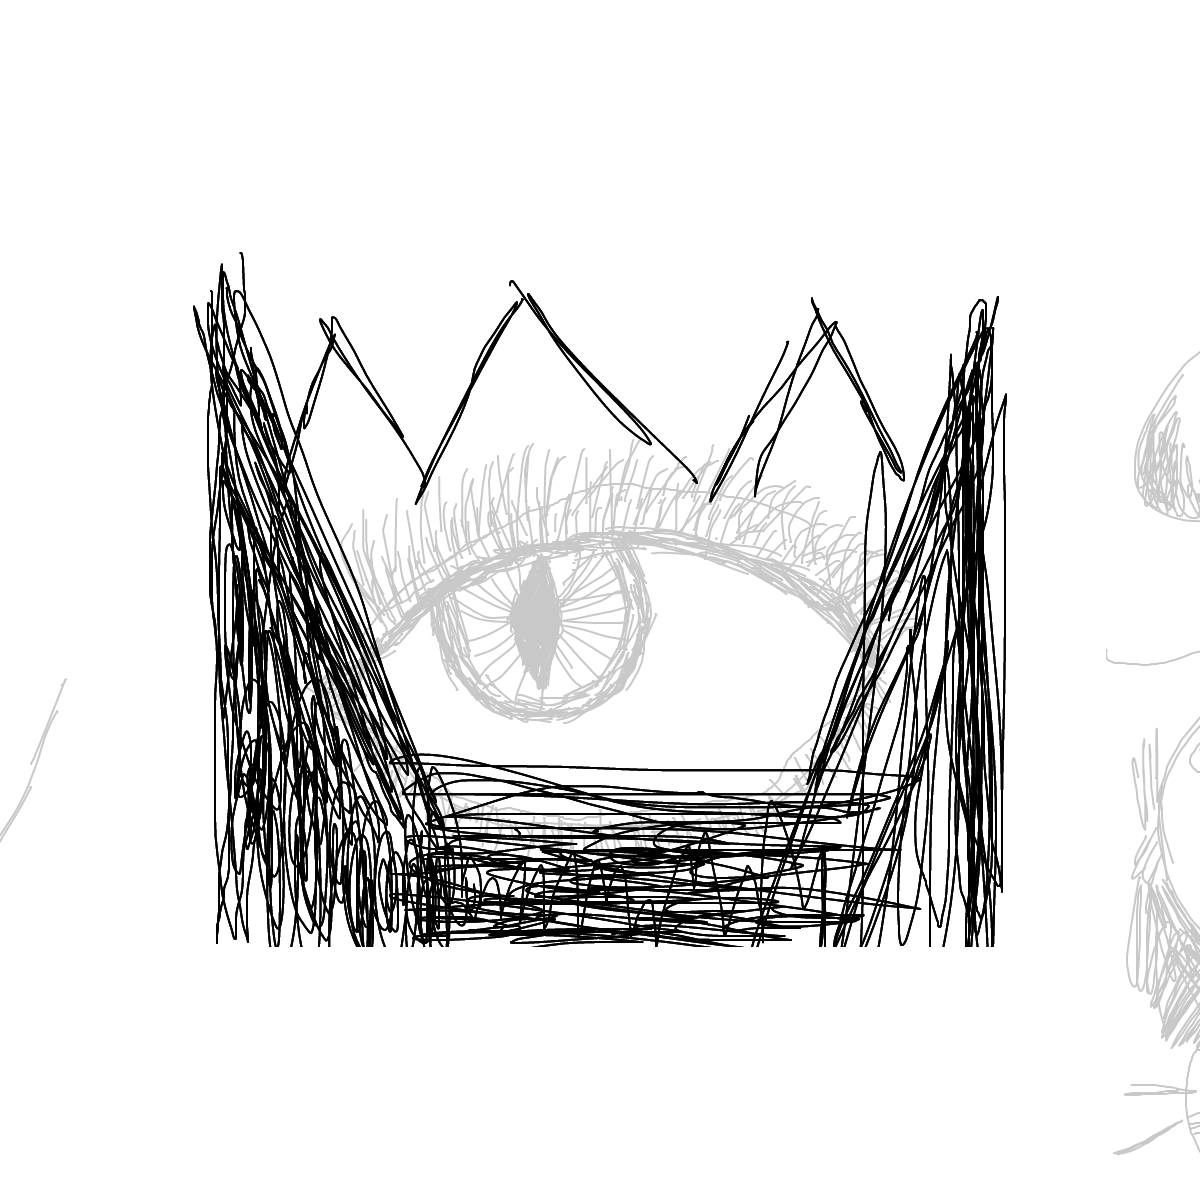 BAAAM drawing#8118 lat:52.0848121643066400lng: 5.1687264442443850